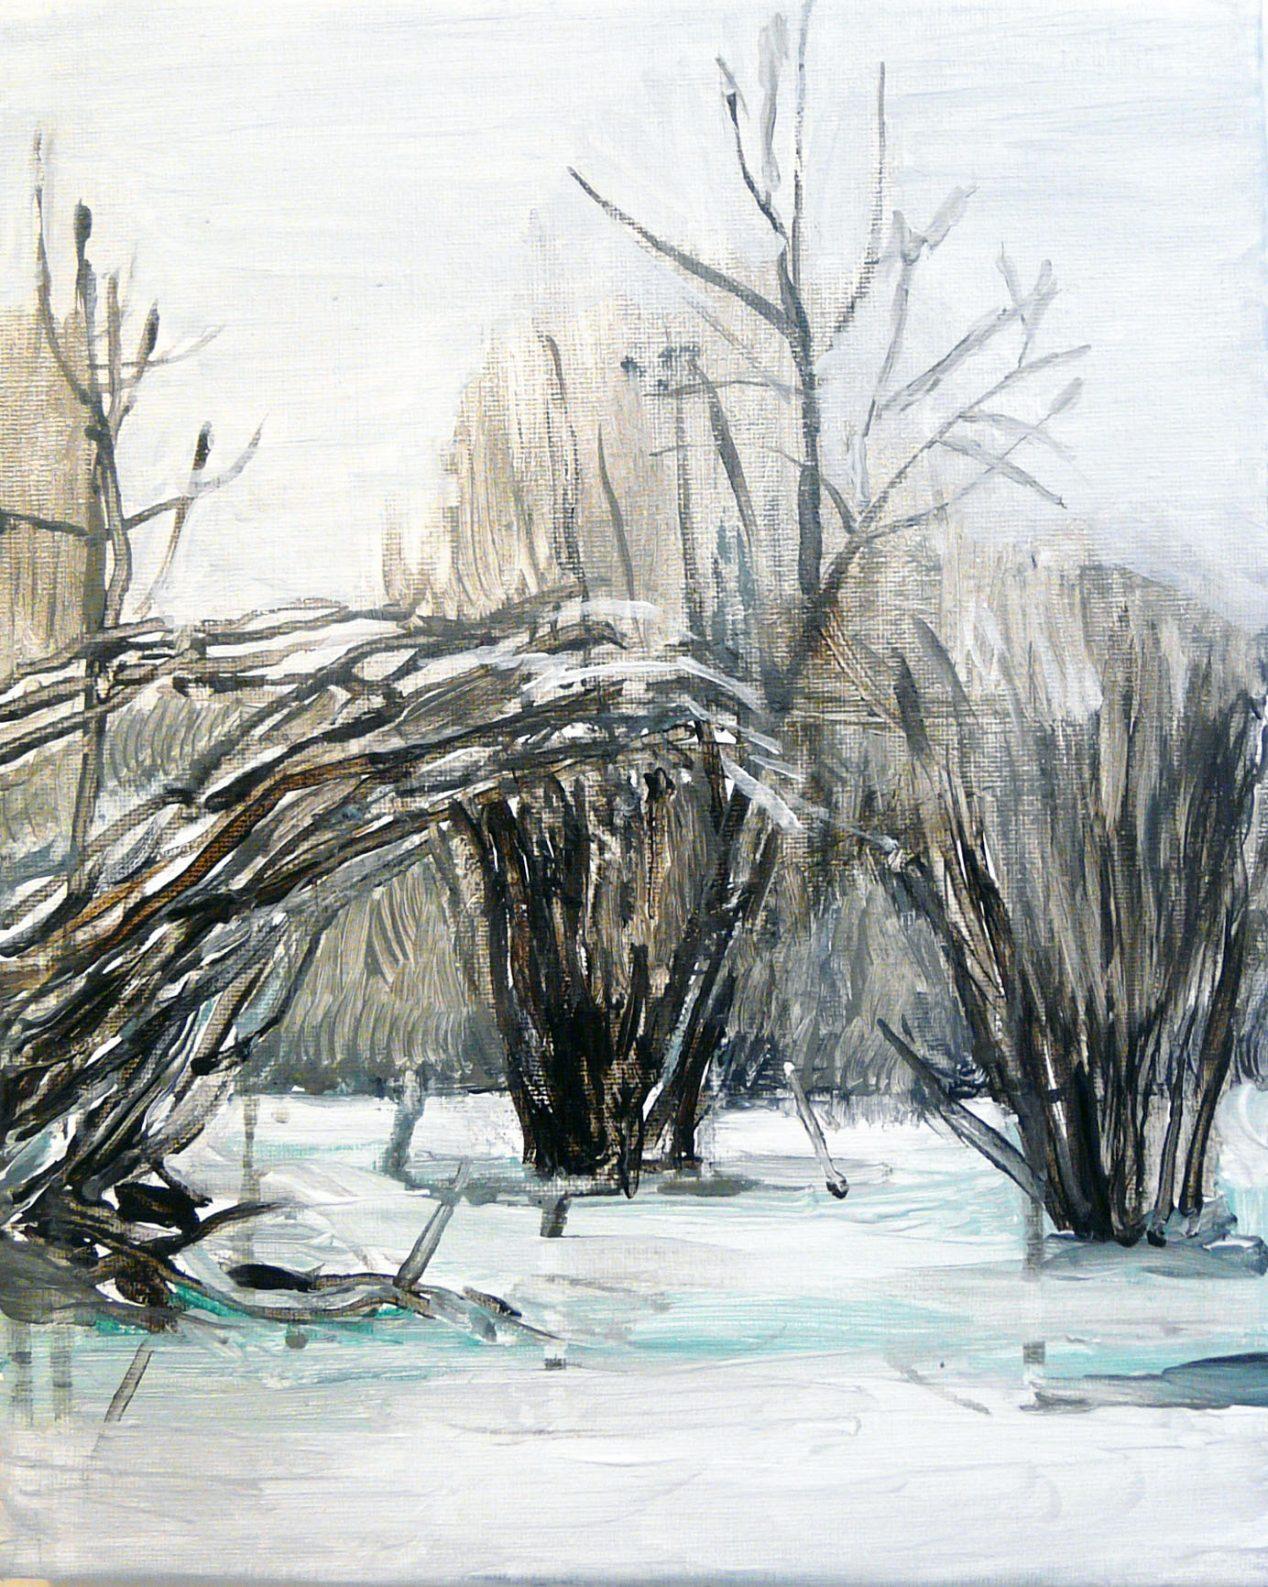 Outskirts Winter 4-5 201530cm x 24cm Acrylic canvas